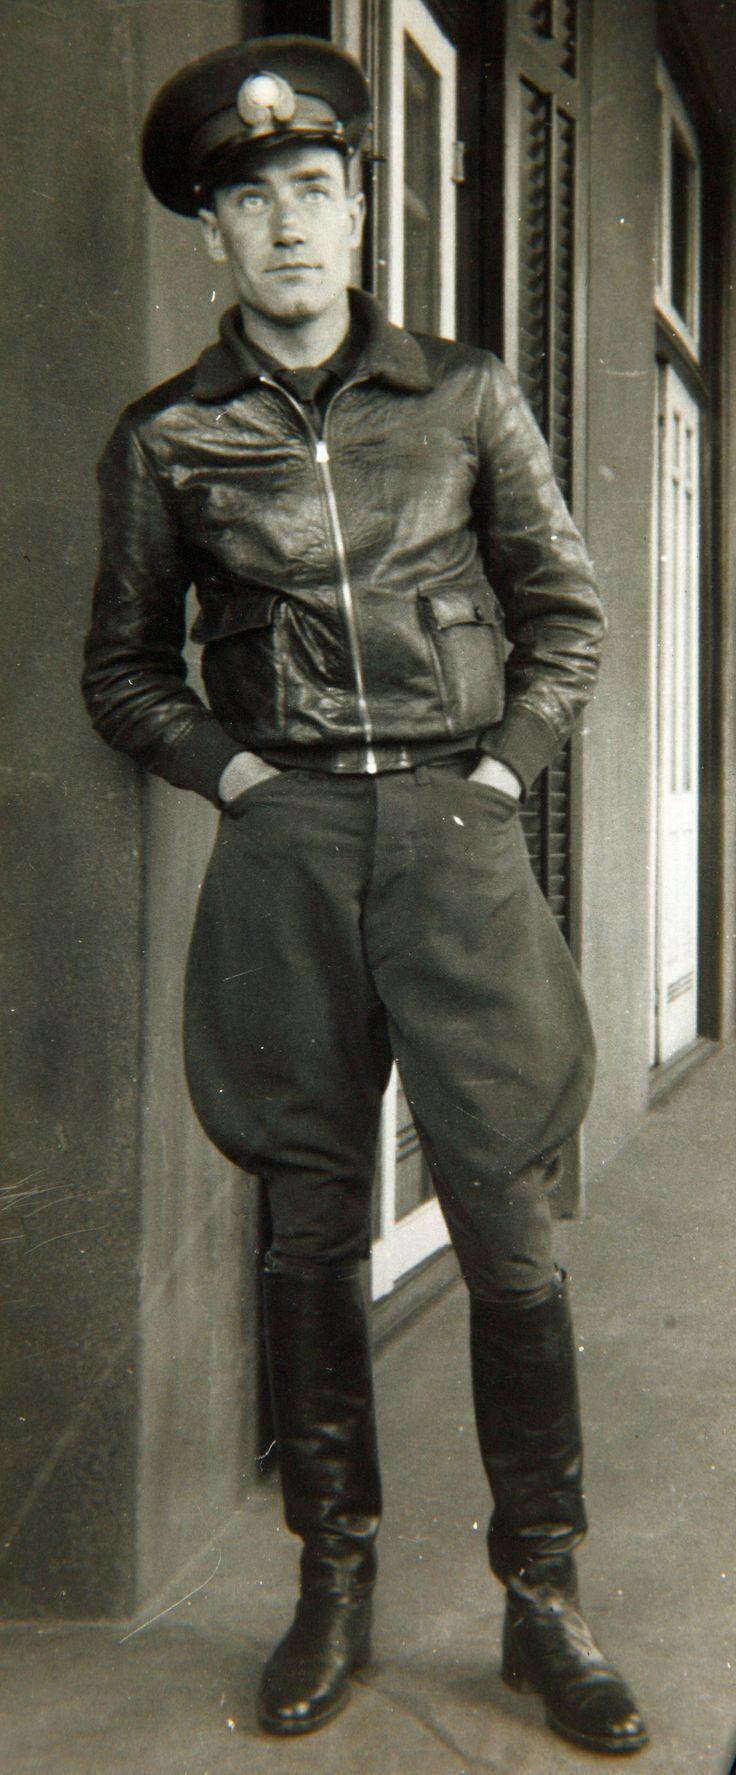 Prewar civilian leather jacket. 12 O'Clock HighAviation